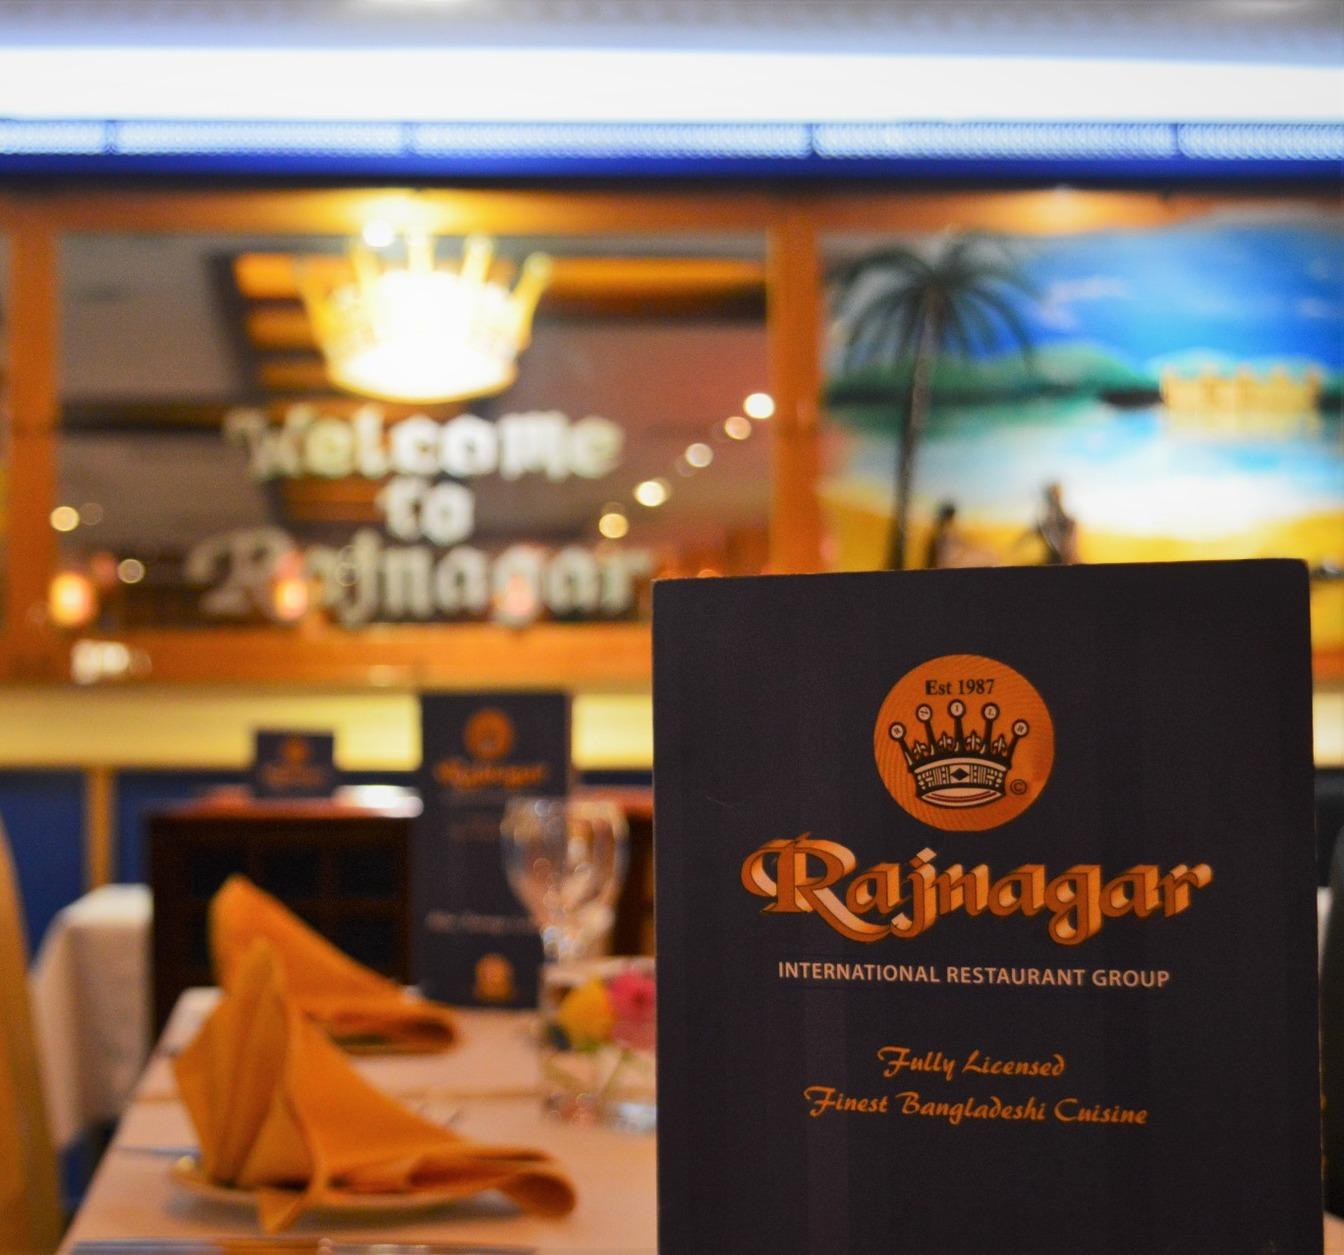 Rajnagar Restaurant Award Winning Indian And Currys In